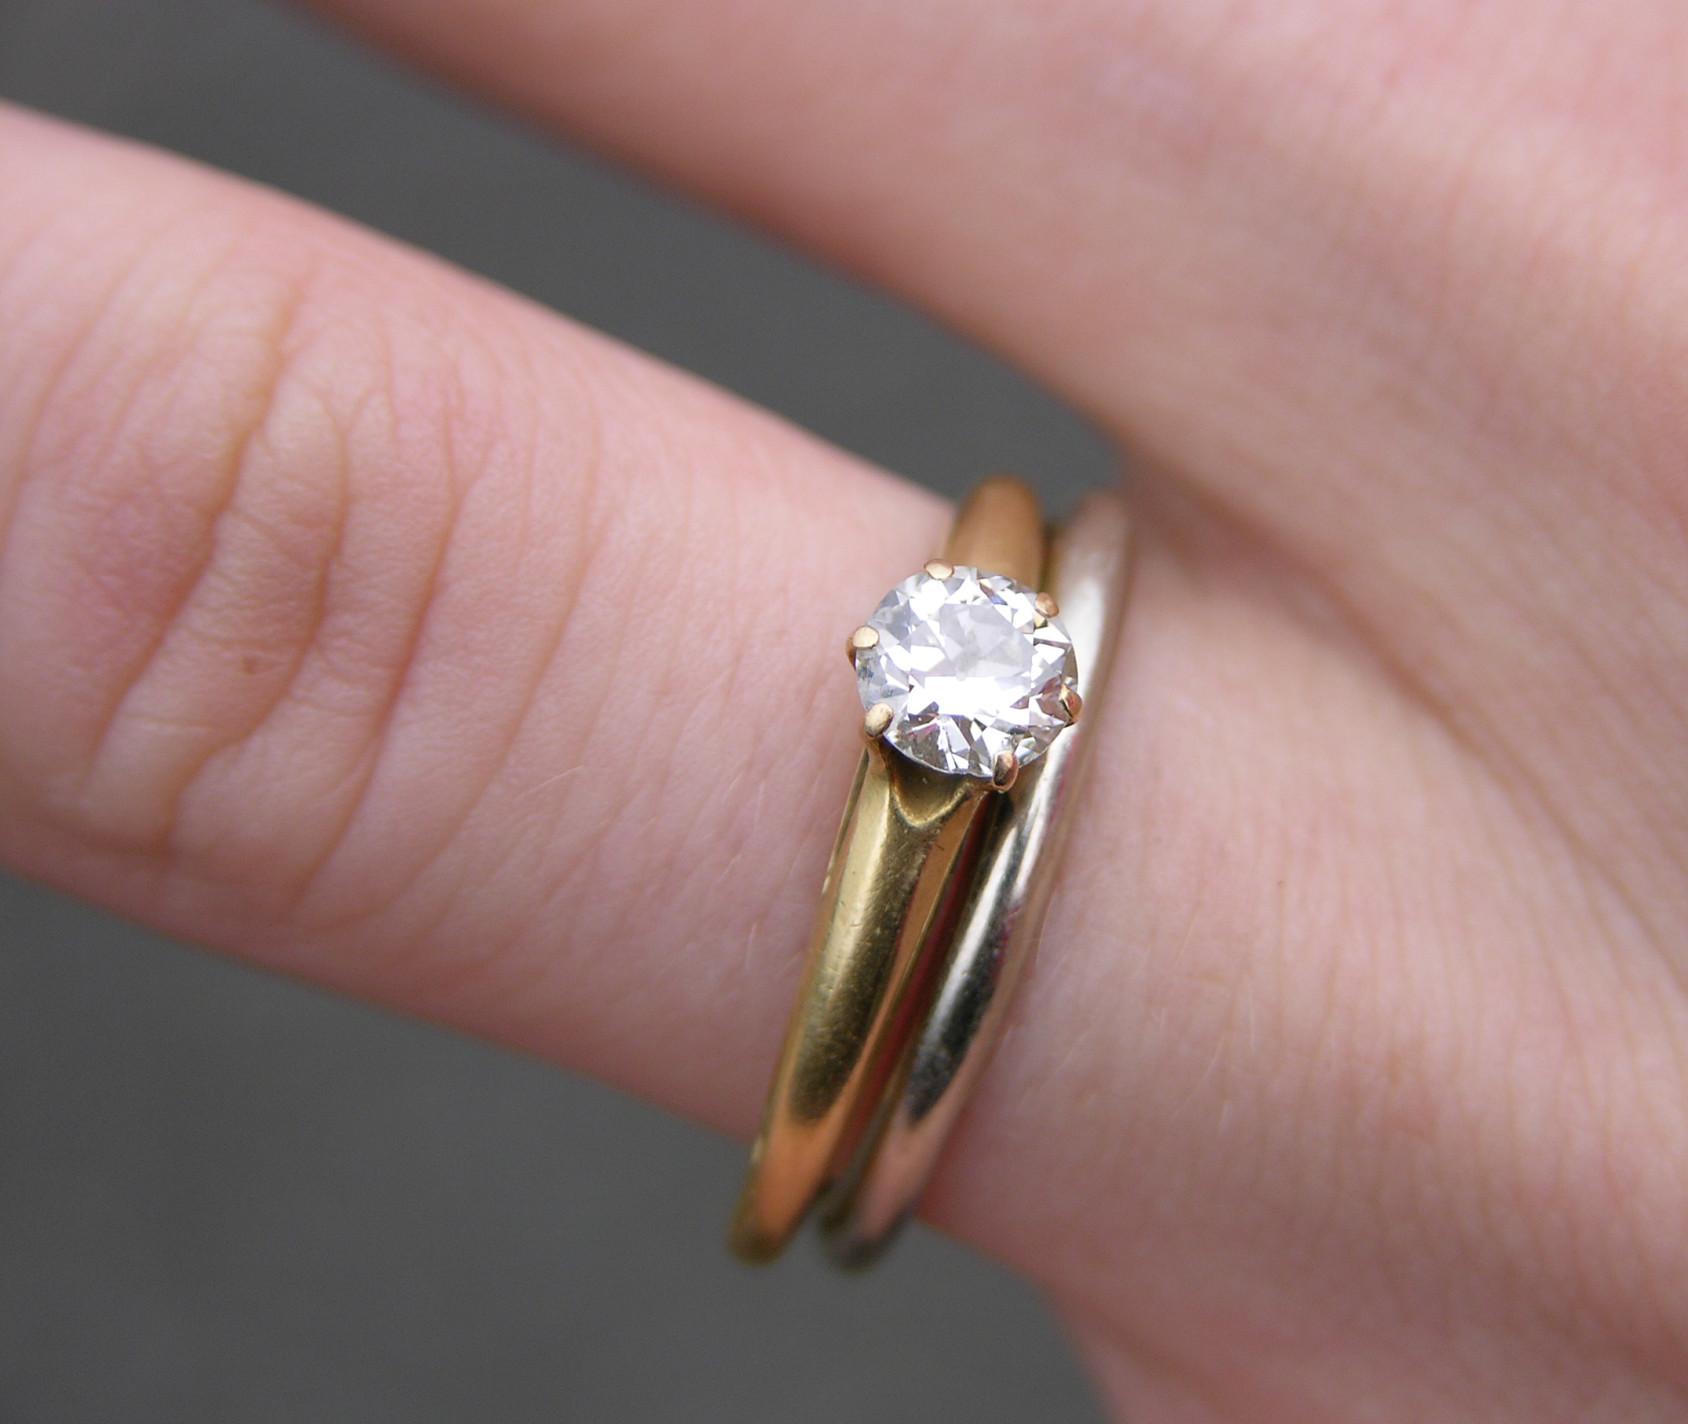 Demande en mariage quel type de bague